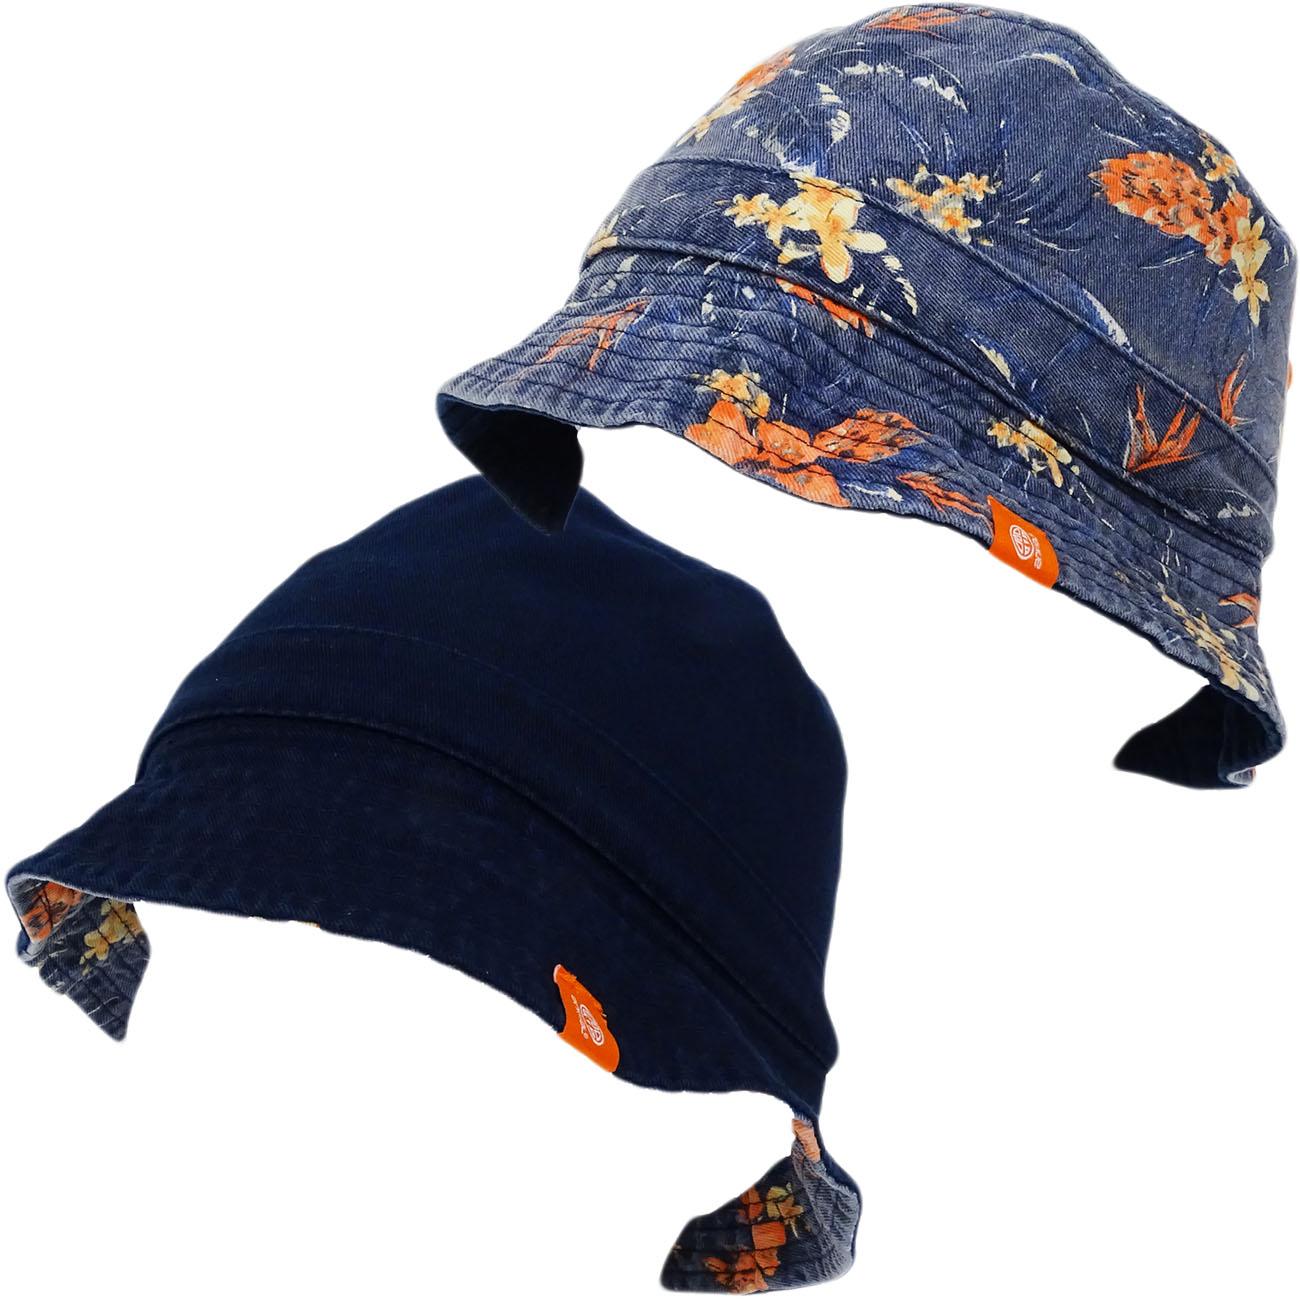 Animal Reversible Bucket Hat - Floral Fisher Cap